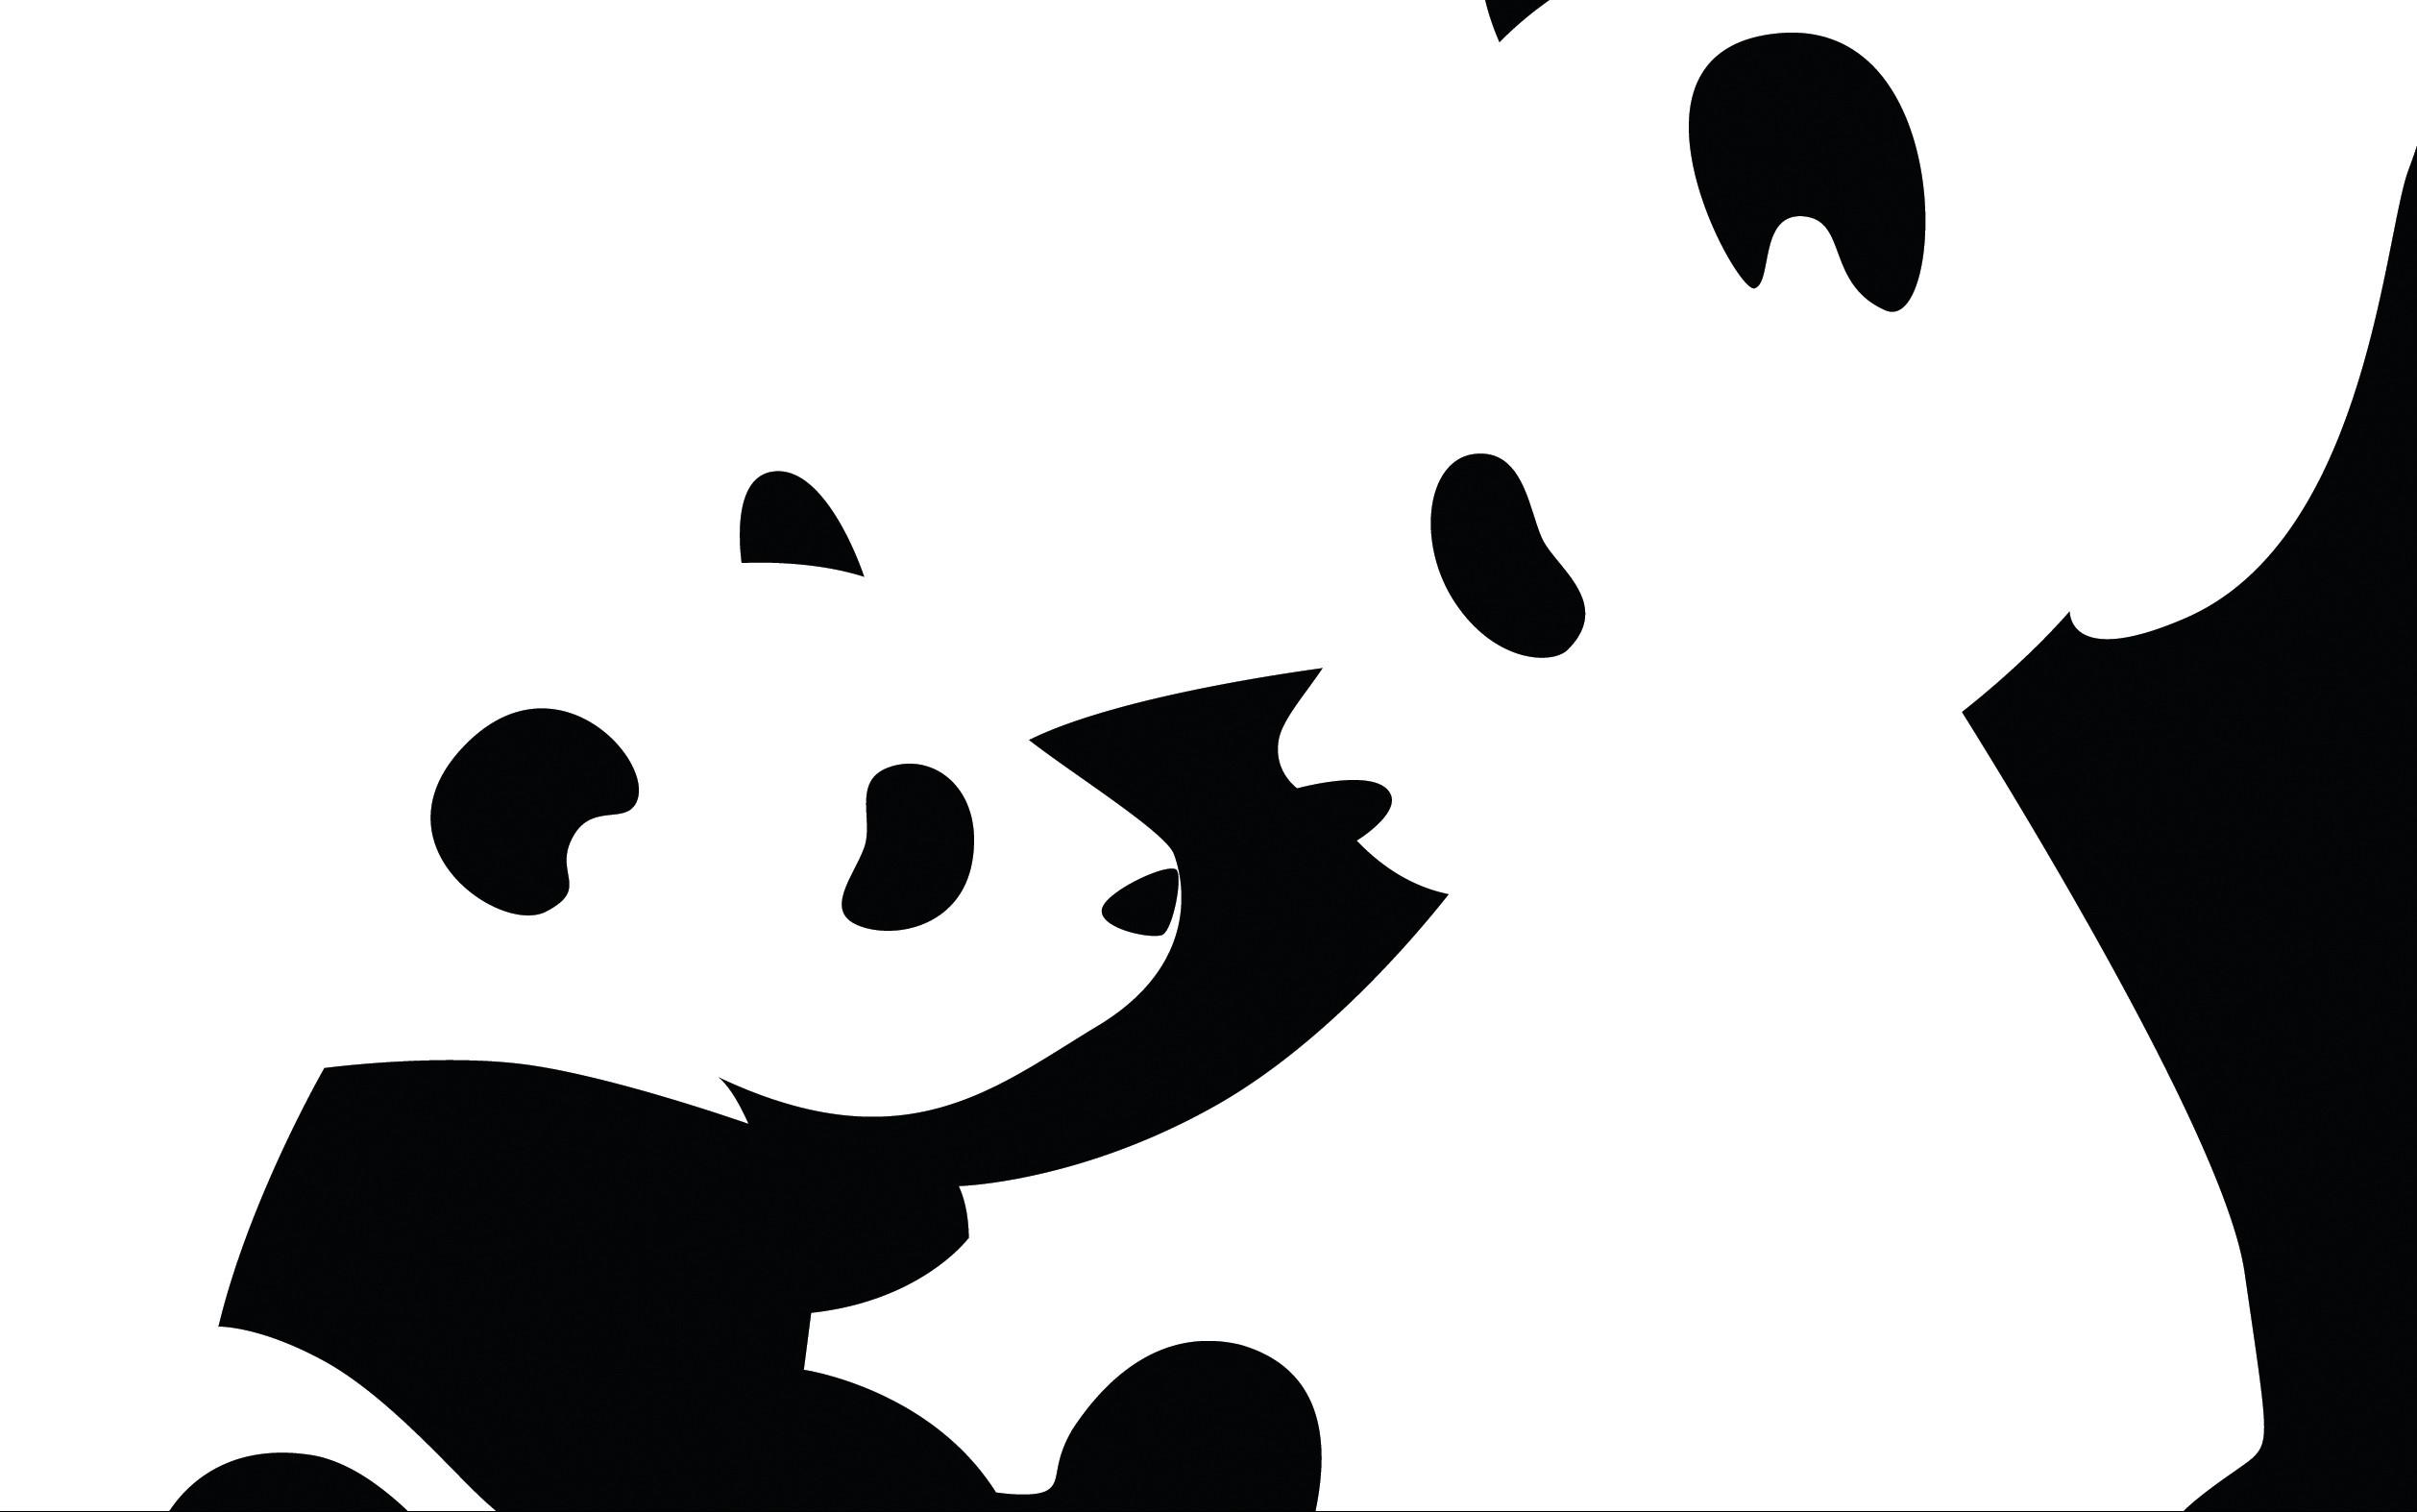 Anime Panda Wallpaper HD Resolution